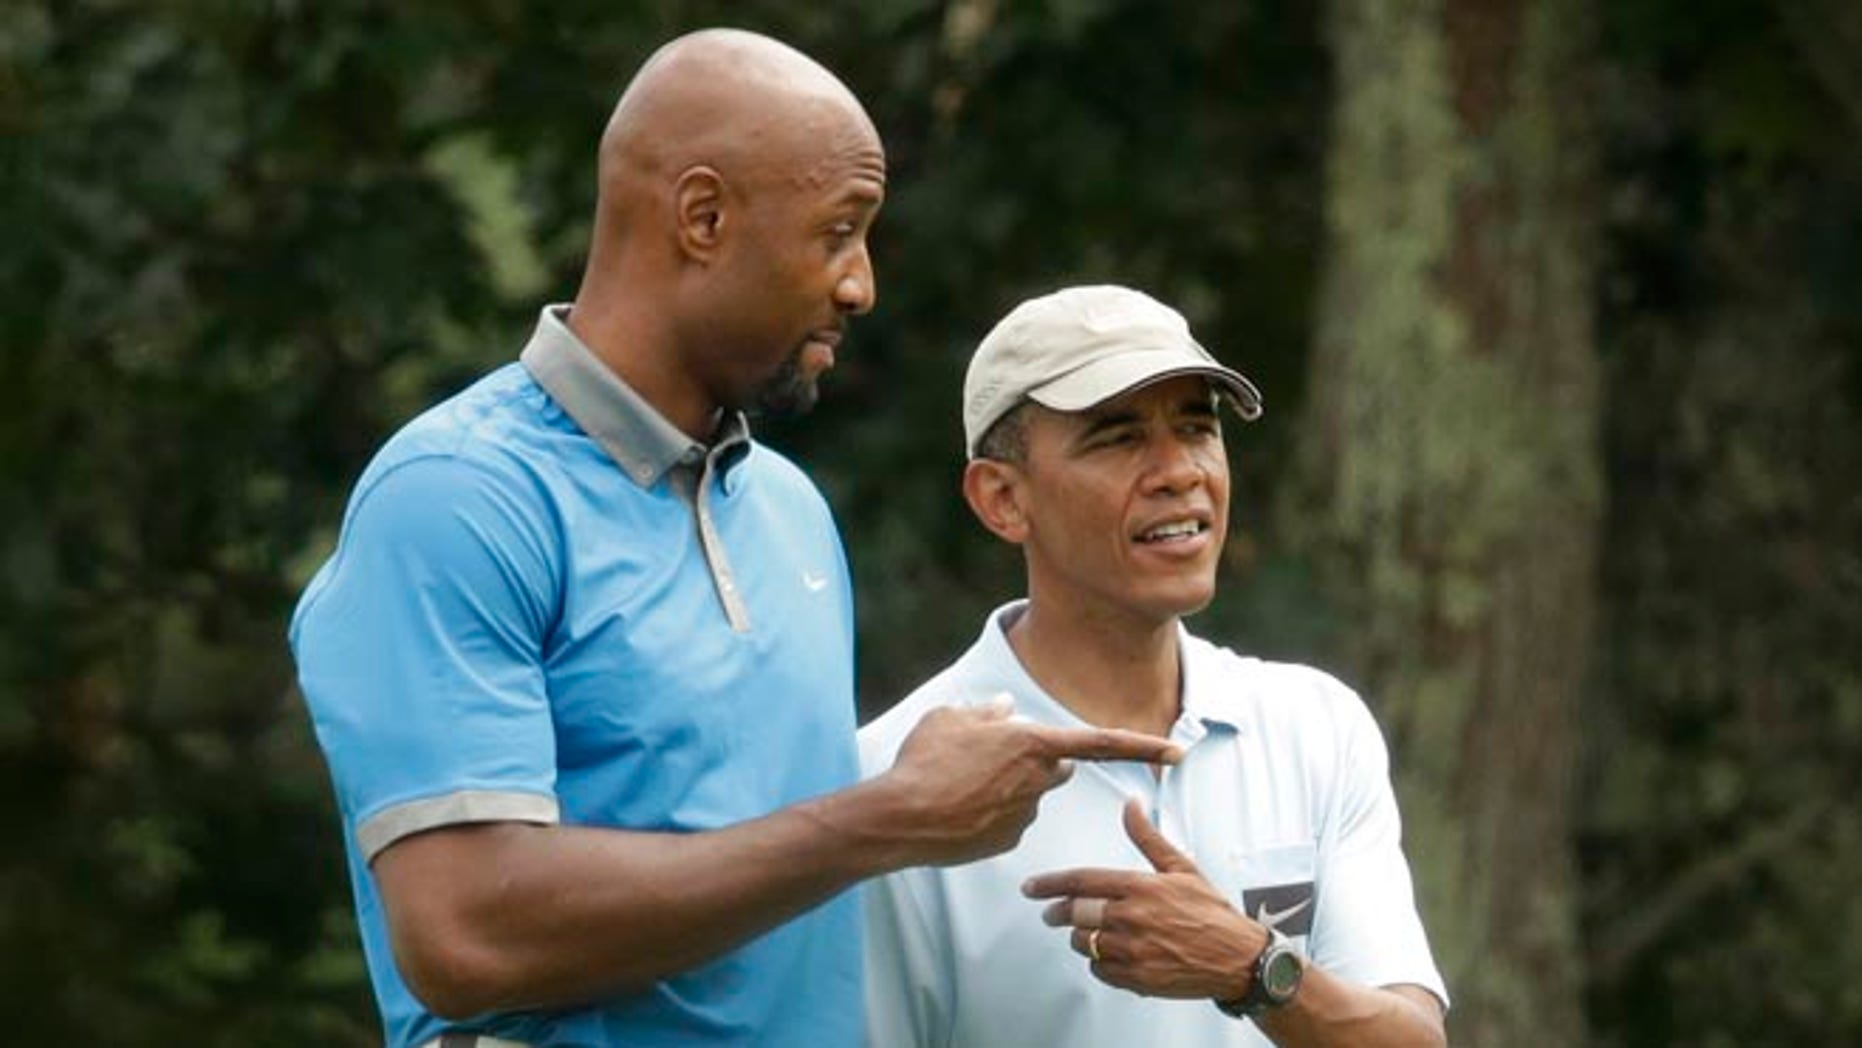 Aug. 17, 2014: Former NBA star Alonzo Mourning, left, and President Obama golfing at Farm Neck Golf Club, in Oak Bluffs, Mass., on Martha's Vineyard.